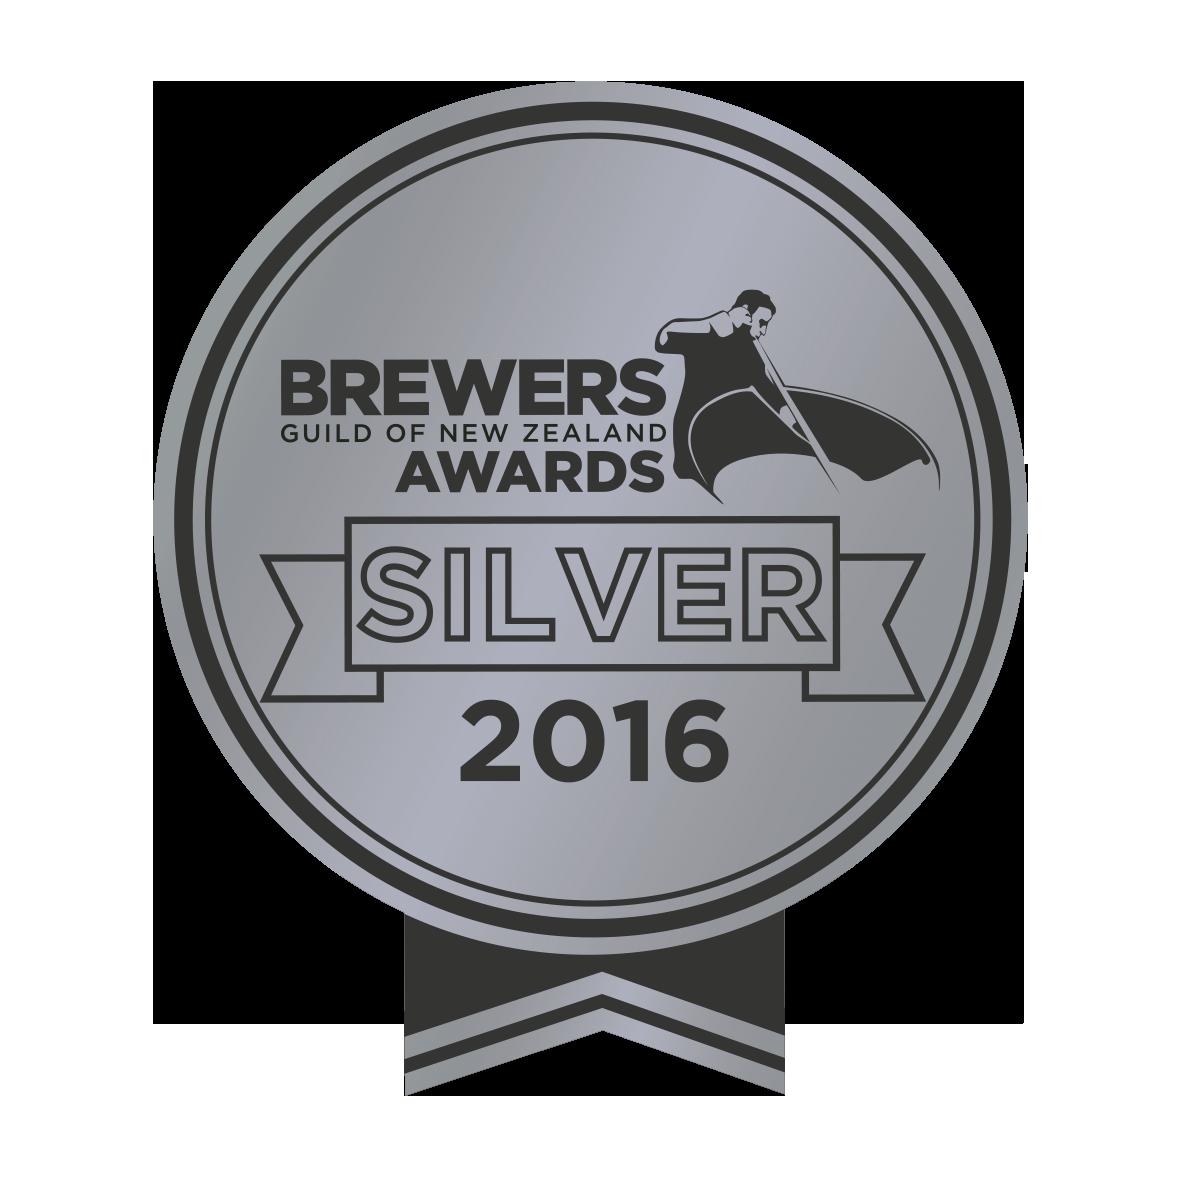 Fern clipart achievement award. Winning craft beer and